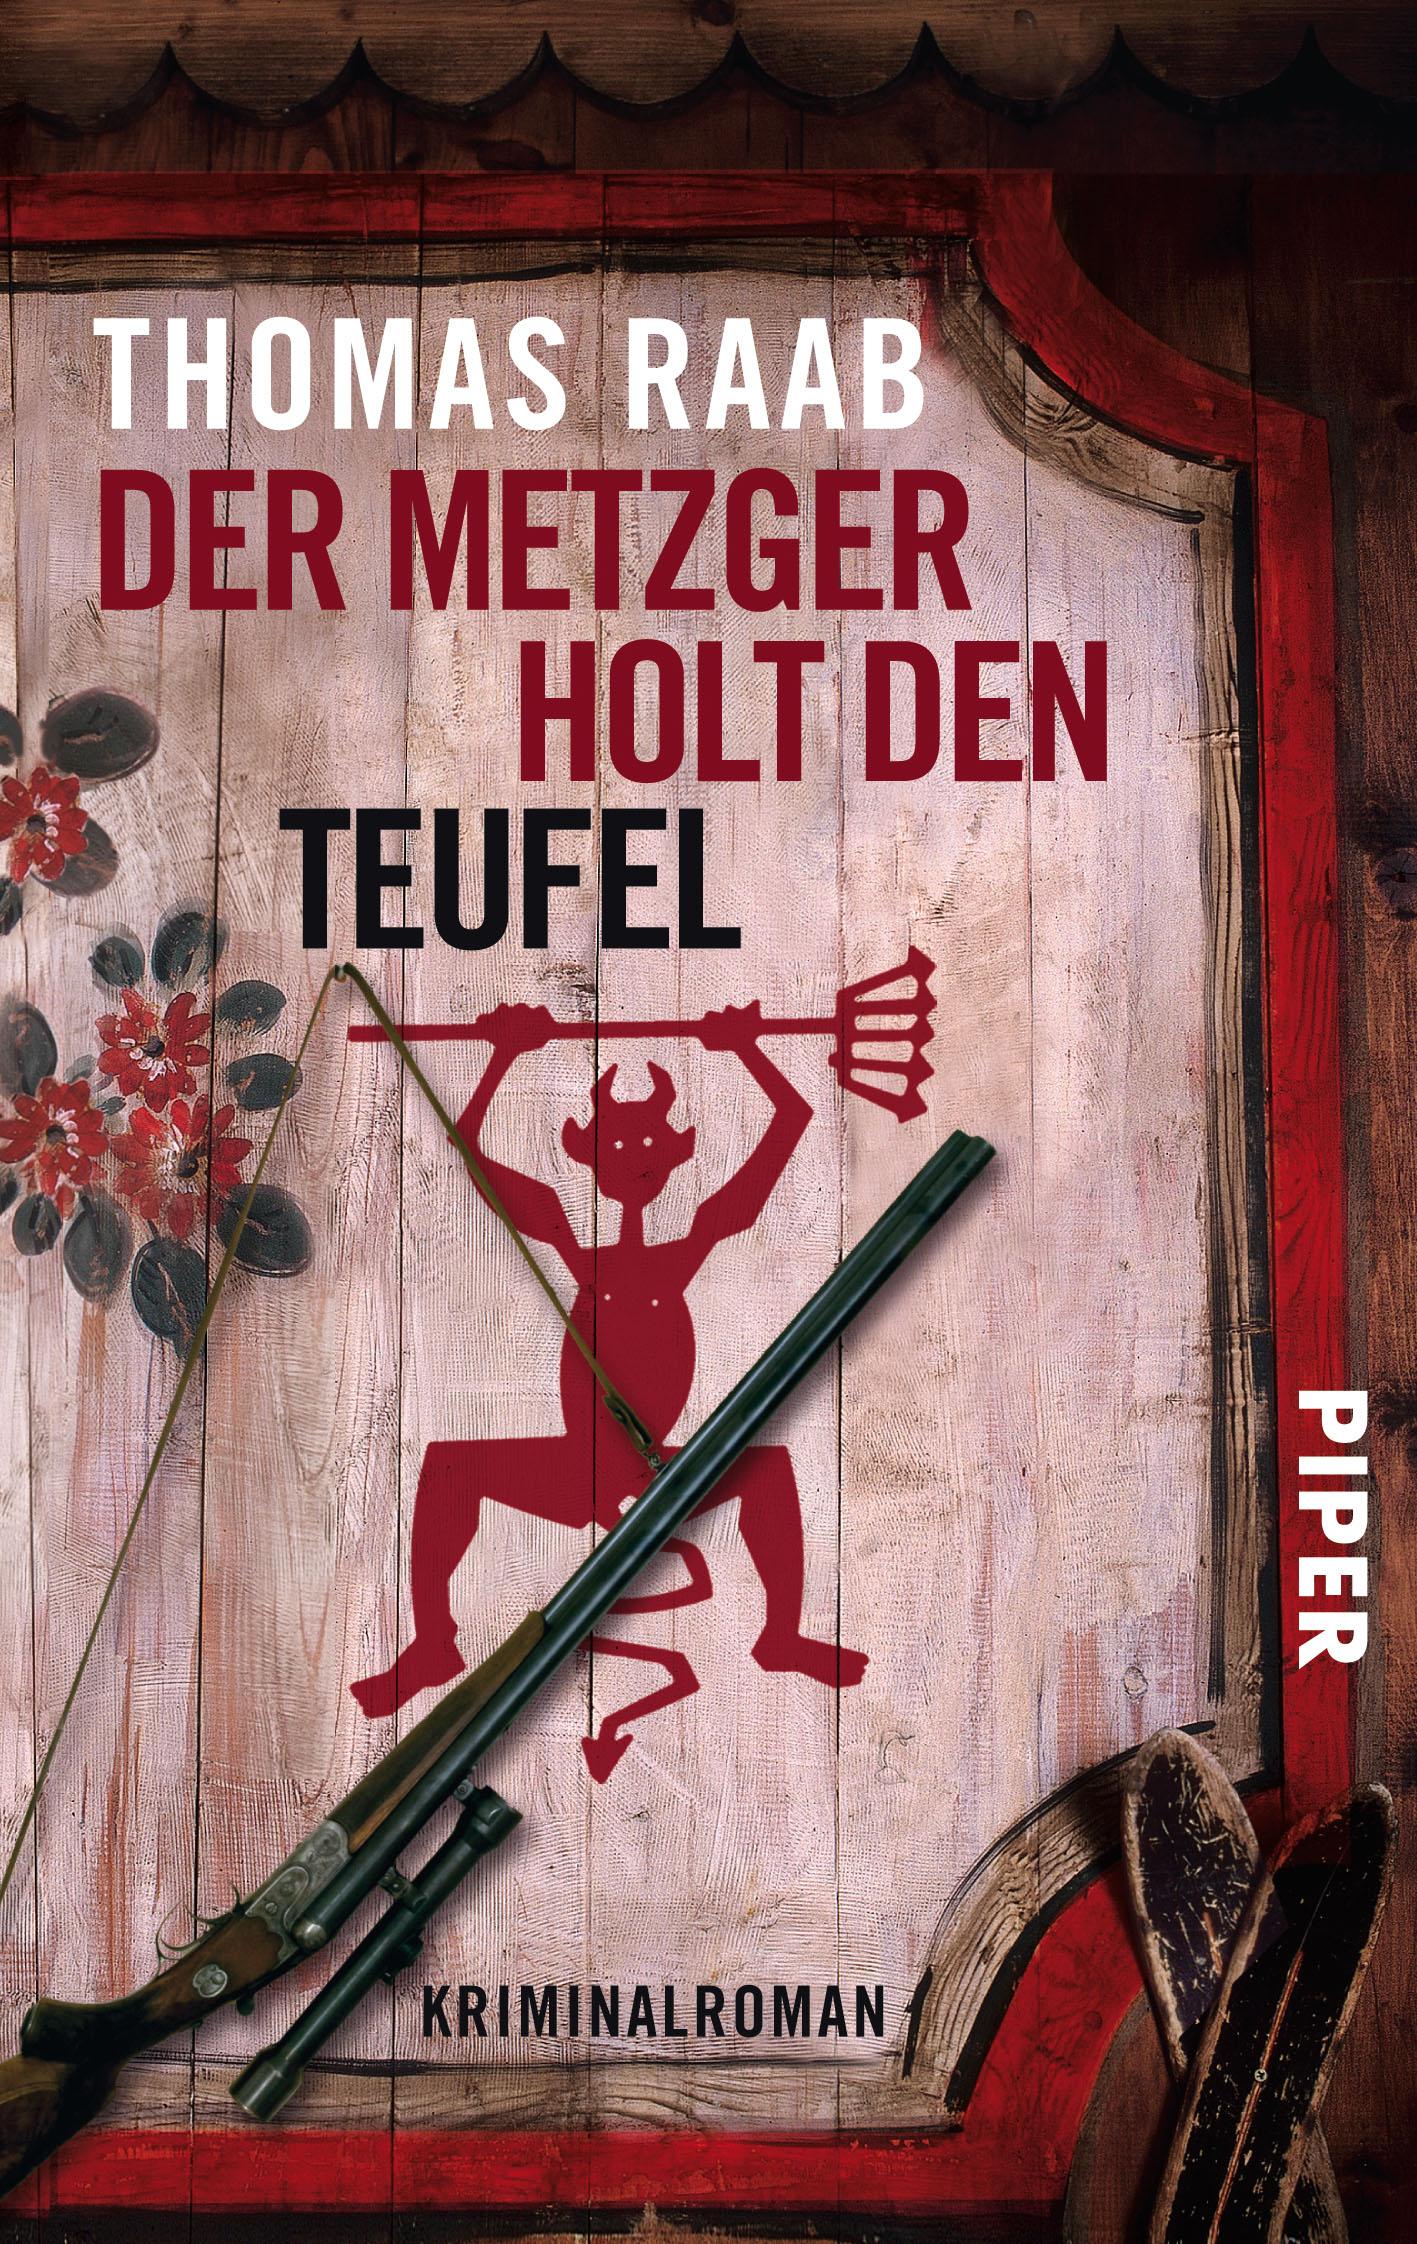 Der Metzger holt den Teufel: Kriminalroman - Thomas Raab